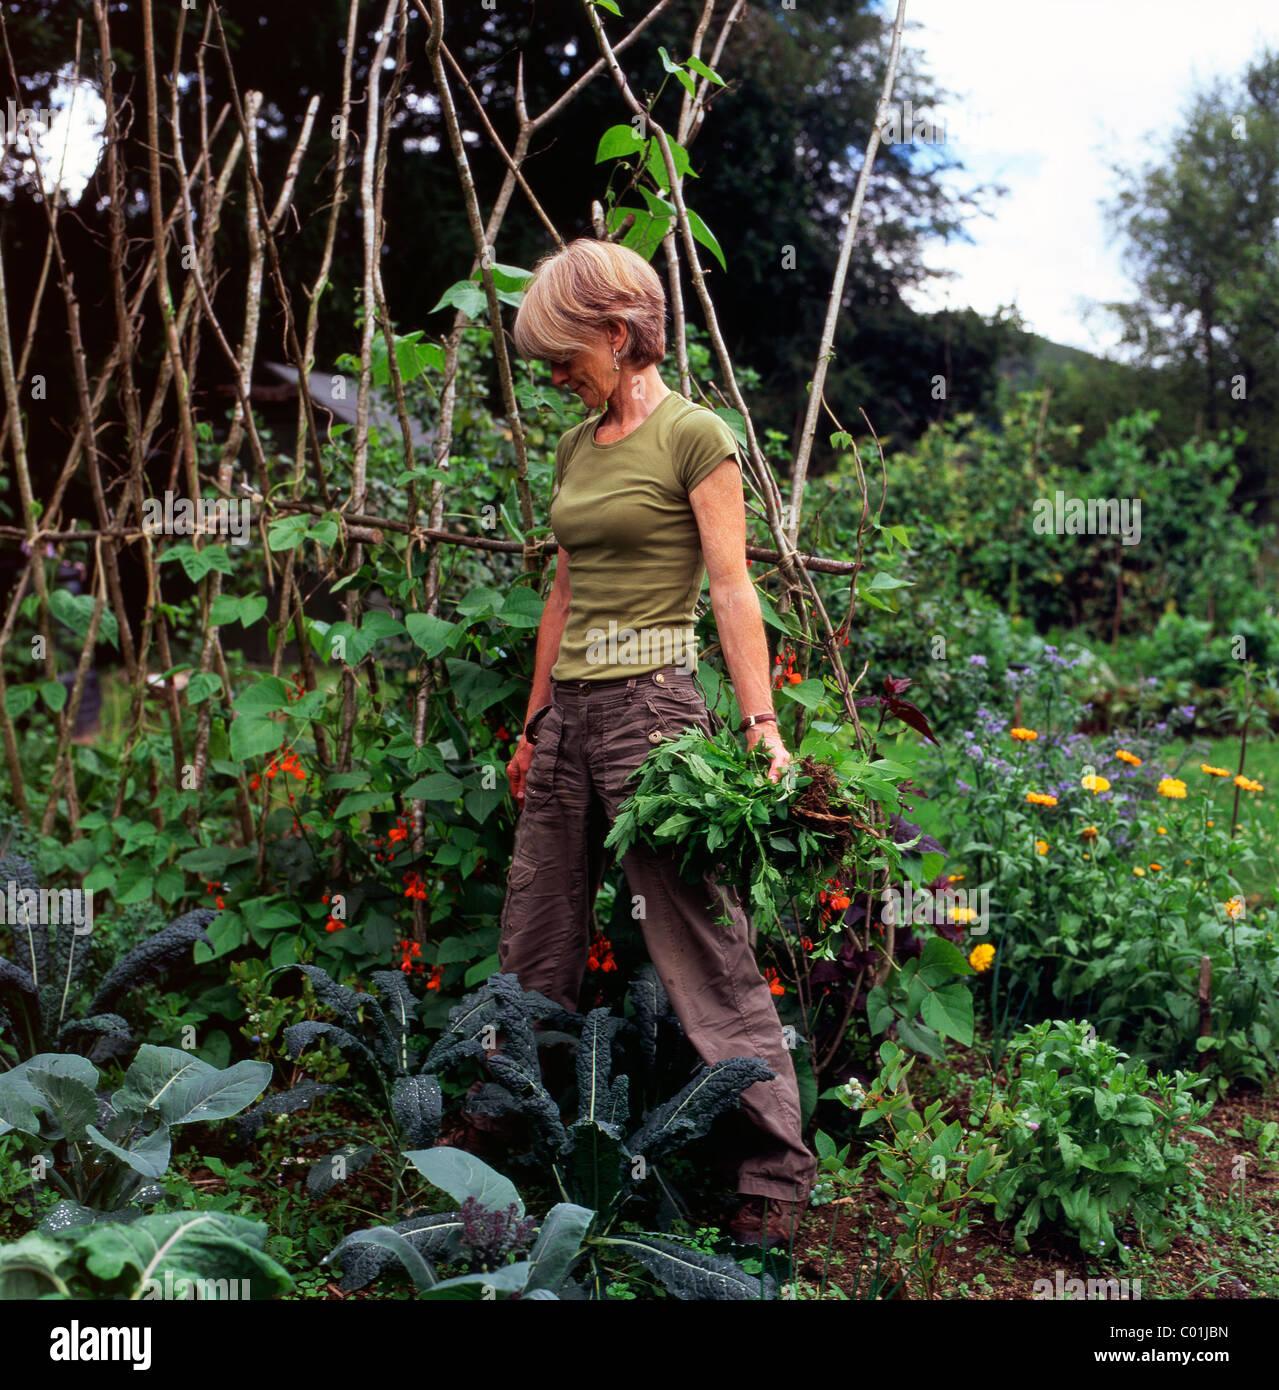 Organic Vegetable Gardening - A woman by runner beans growing in her organic vegetable garden in carmarthenshire wales uk kathy dewitt